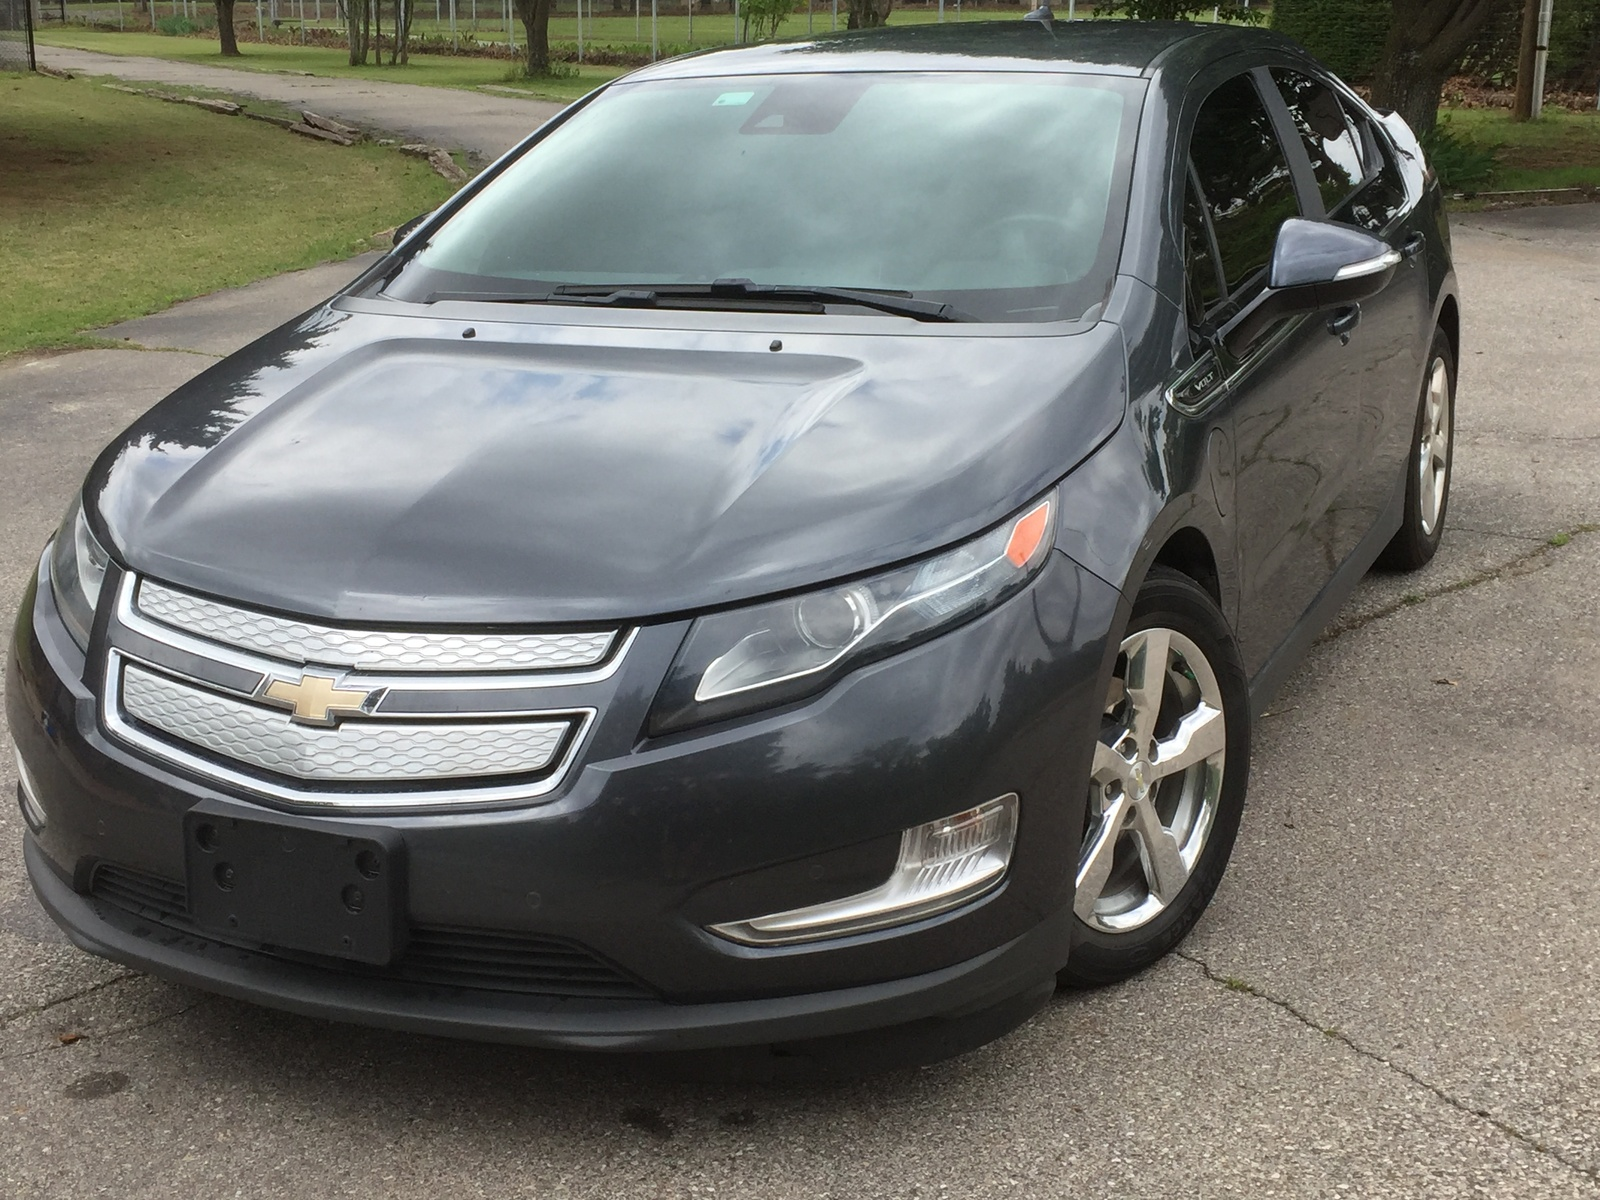 plug photos hybrid chevrolet info car driver photo price reviews original in and specs volt official s